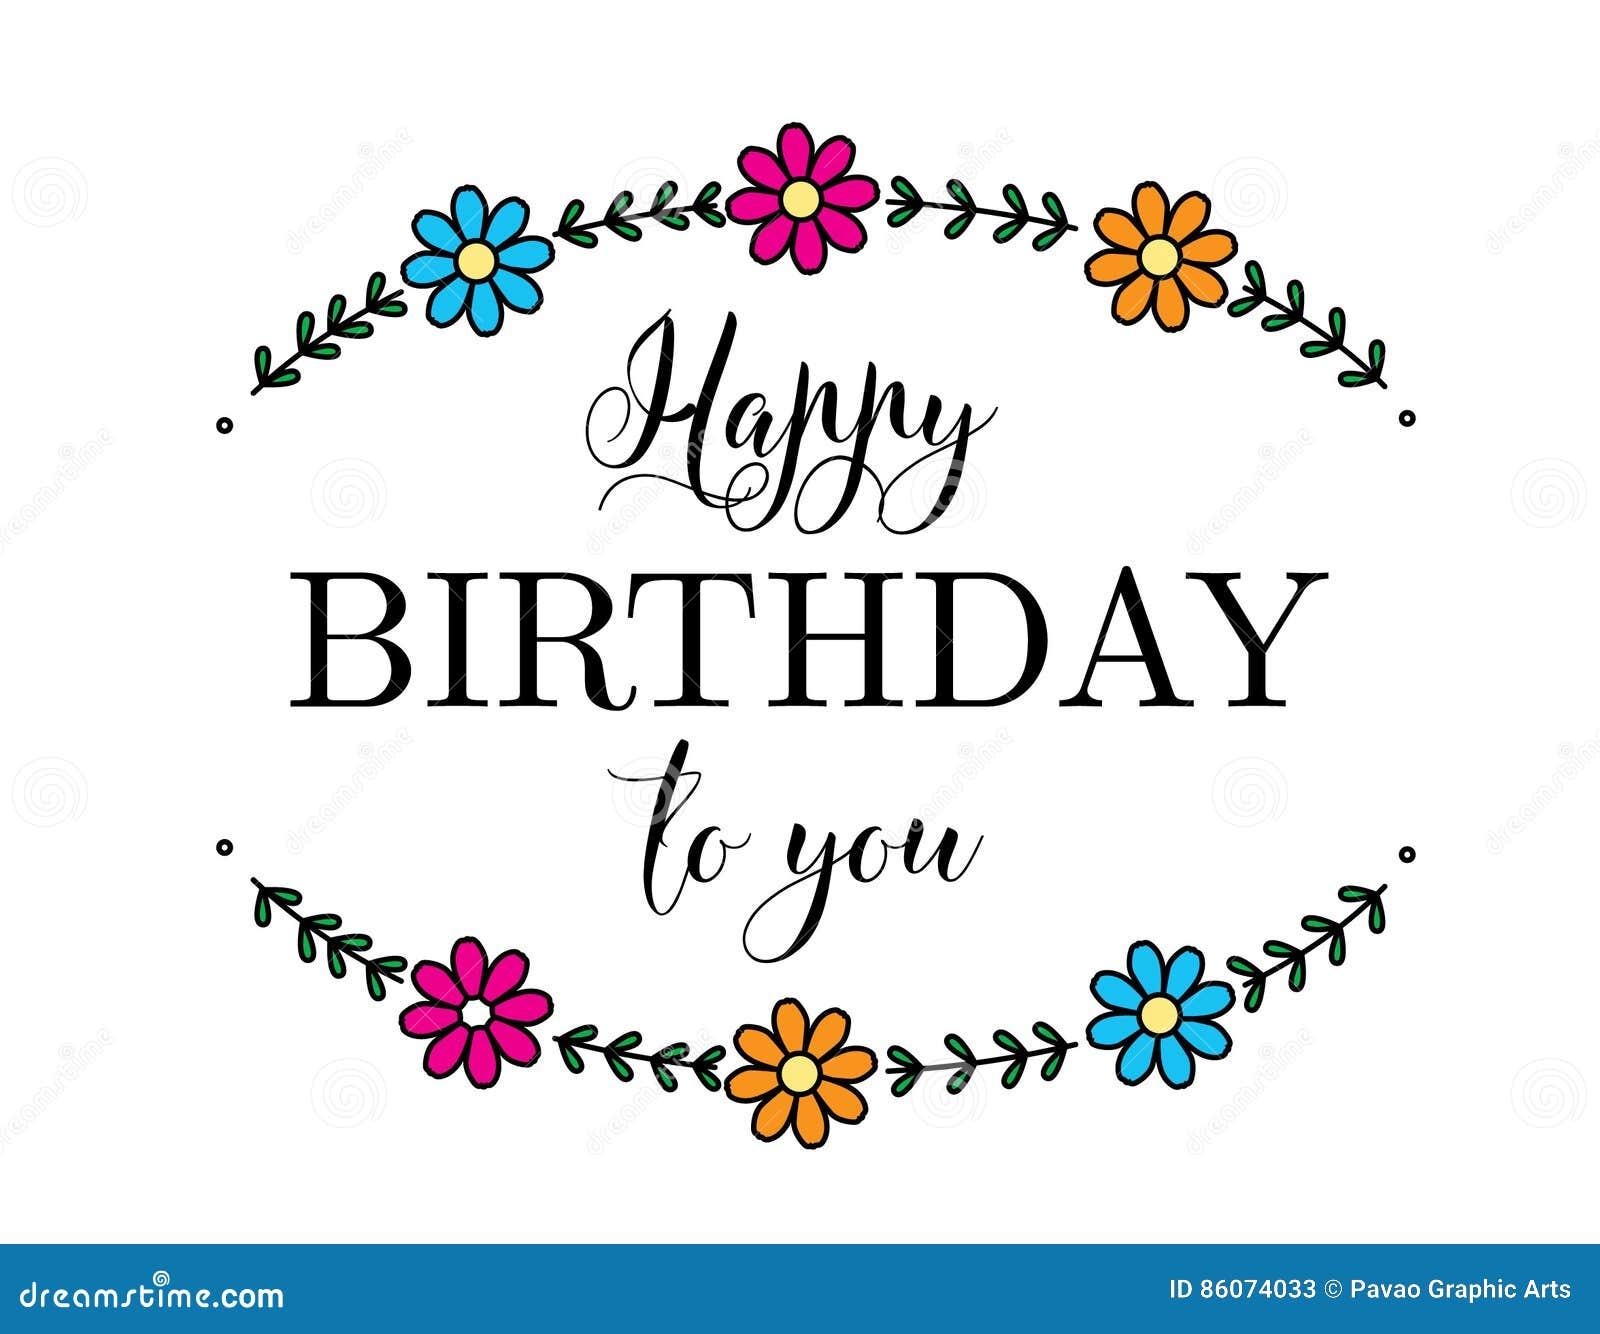 Happy birthday flower card stock vector illustration of card 86074033 happy birthday flower card izmirmasajfo